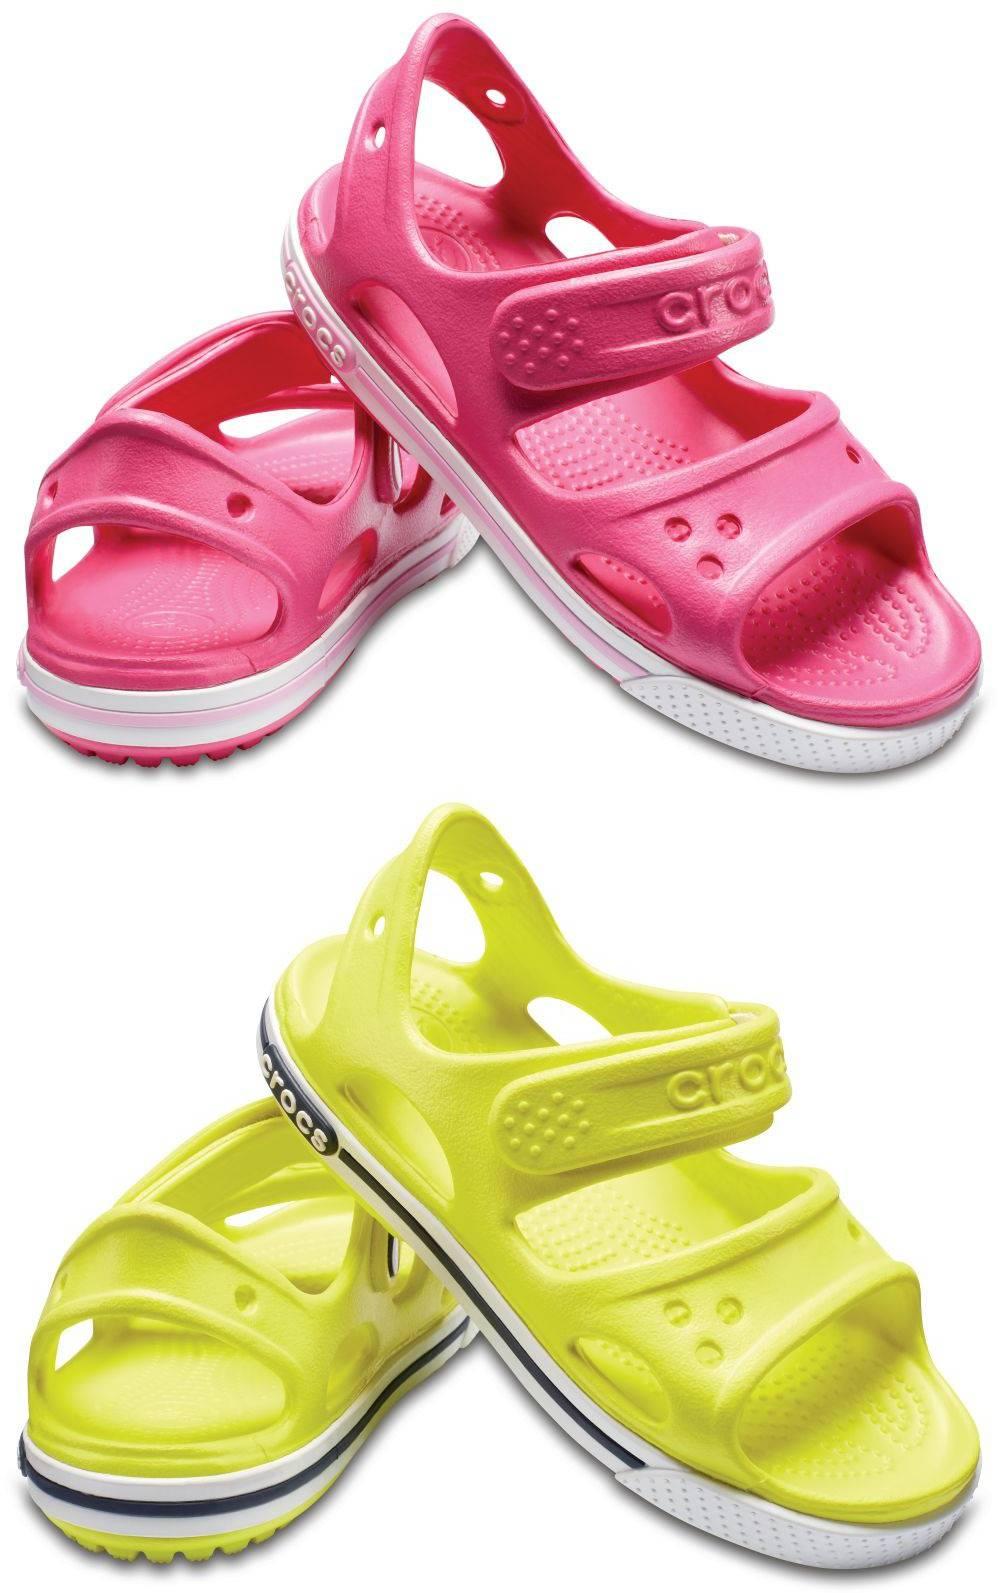 CROCS Crocband II Sandal Kids Kinder Sandalen Schuhe